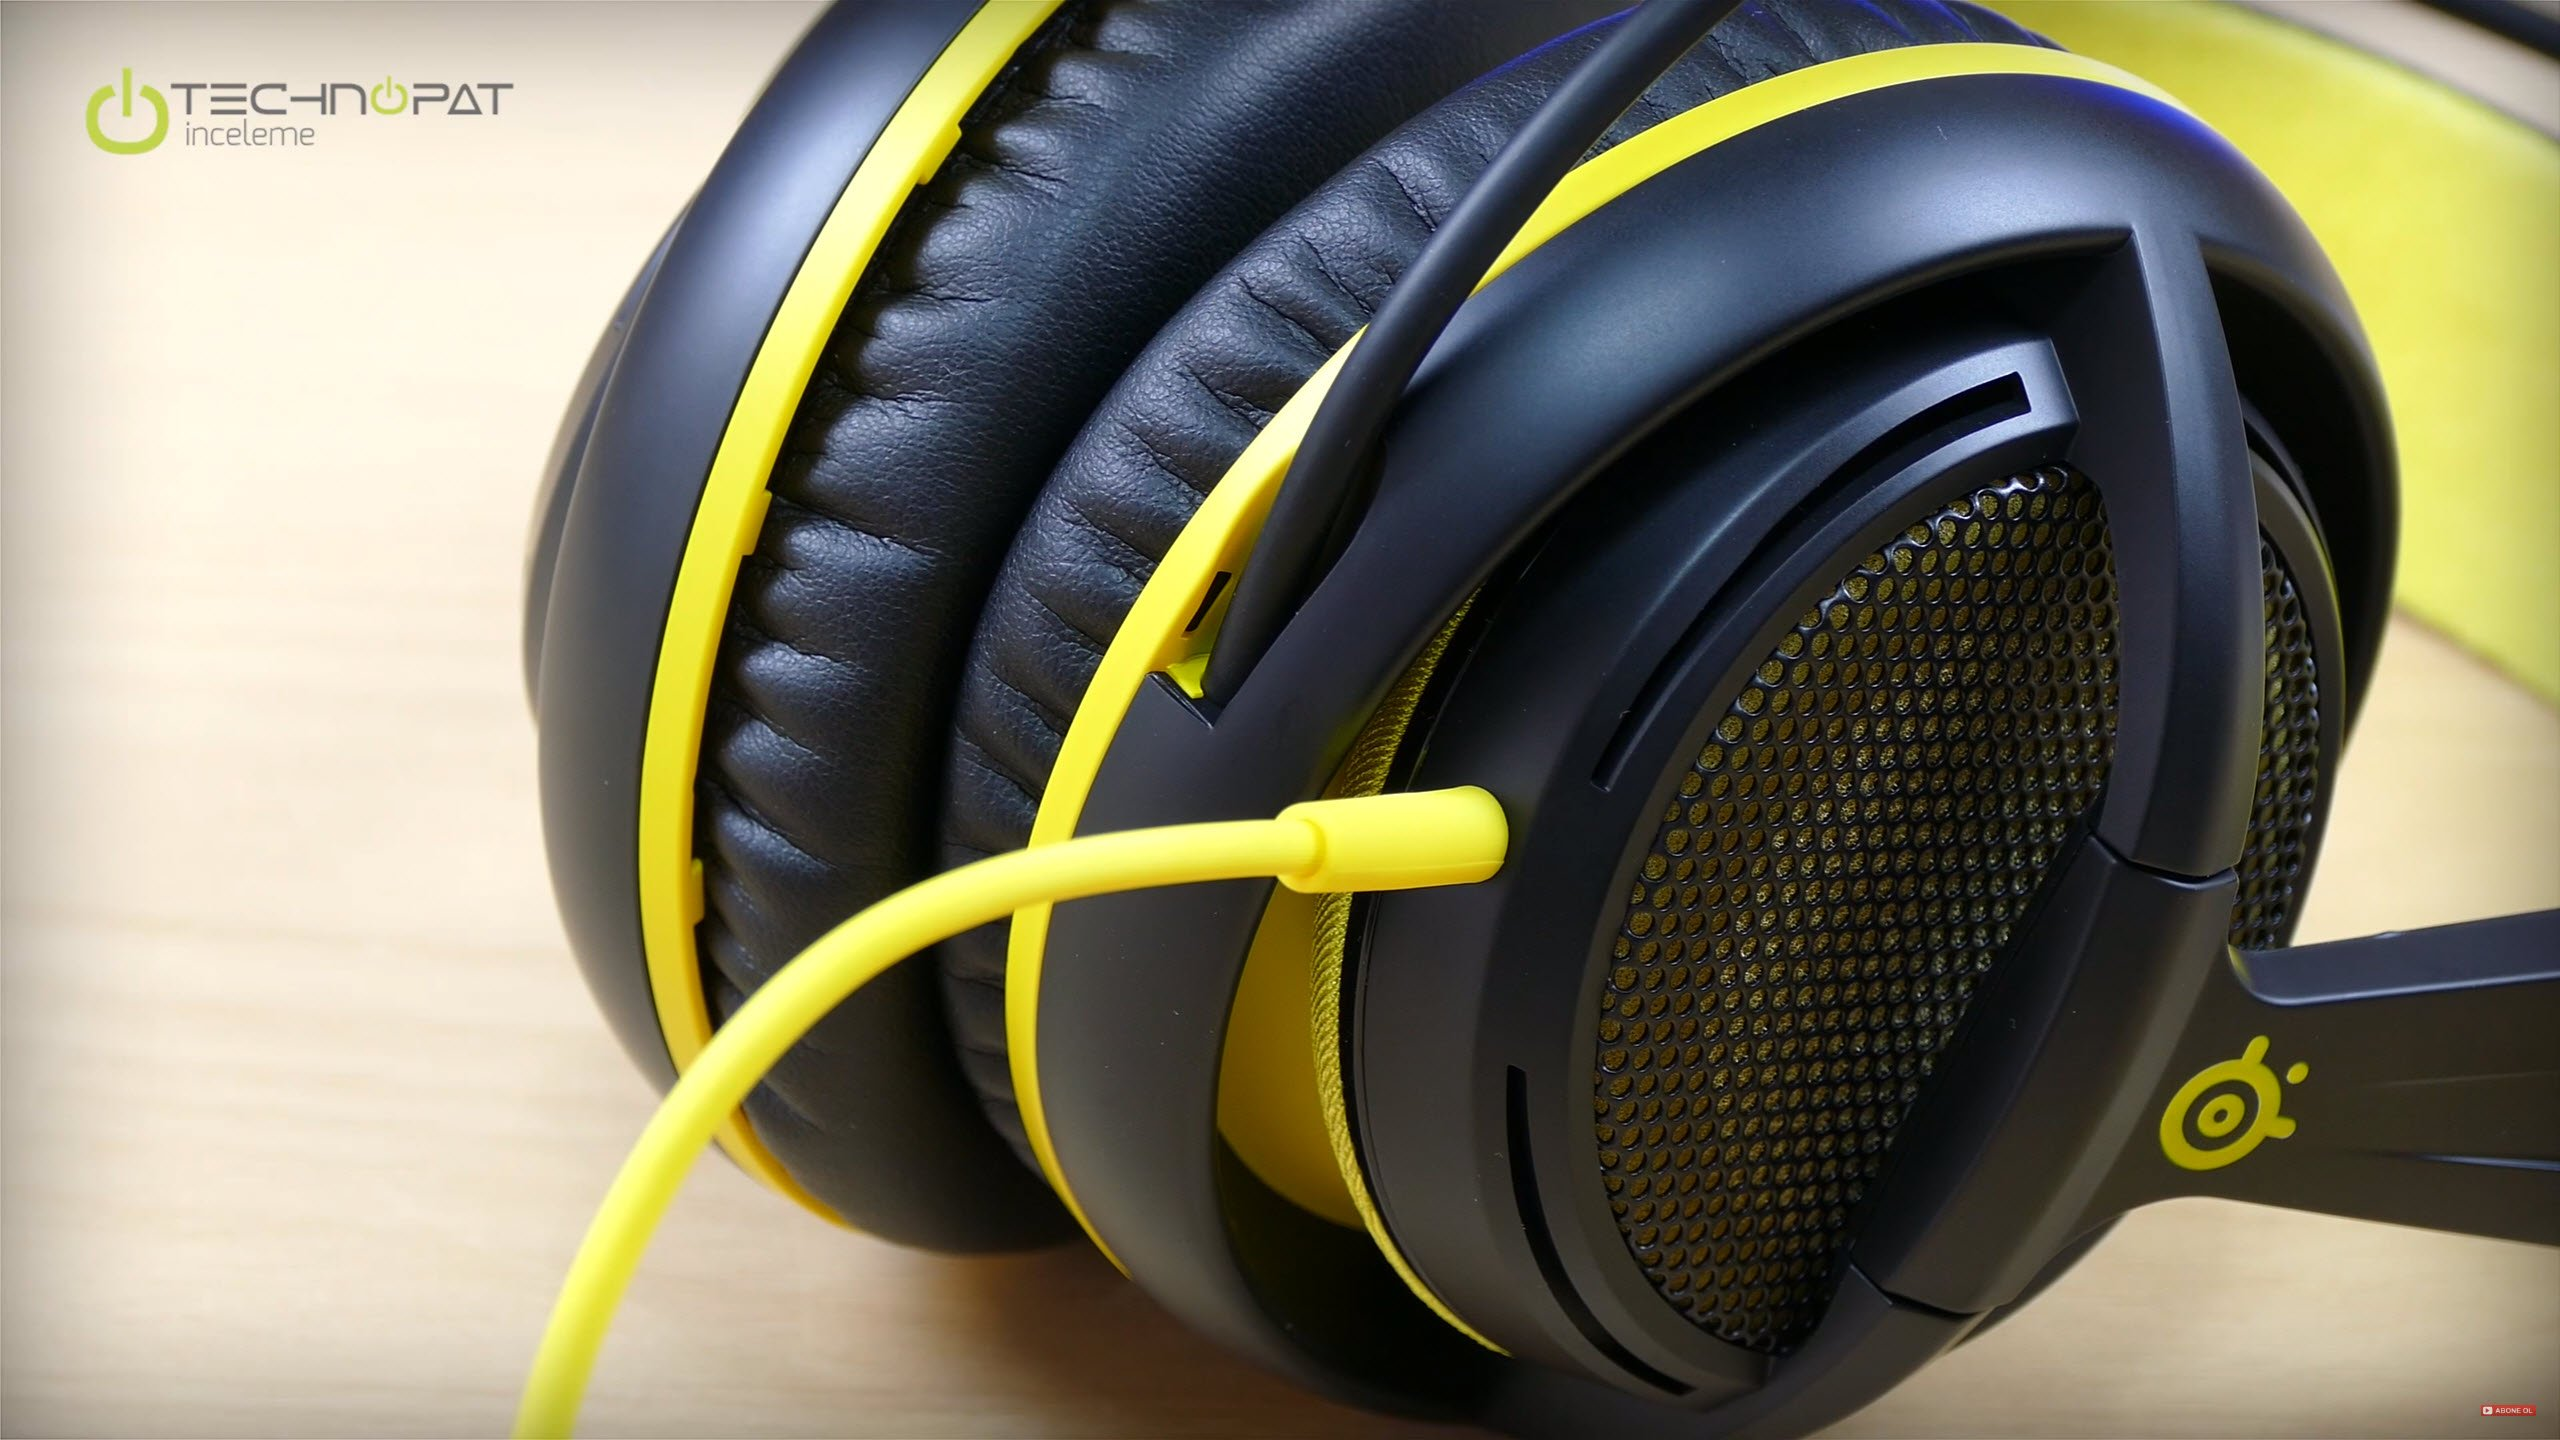 steelseries-siberia-200-oyuncu-kulakliği-inceleme-technopat-7